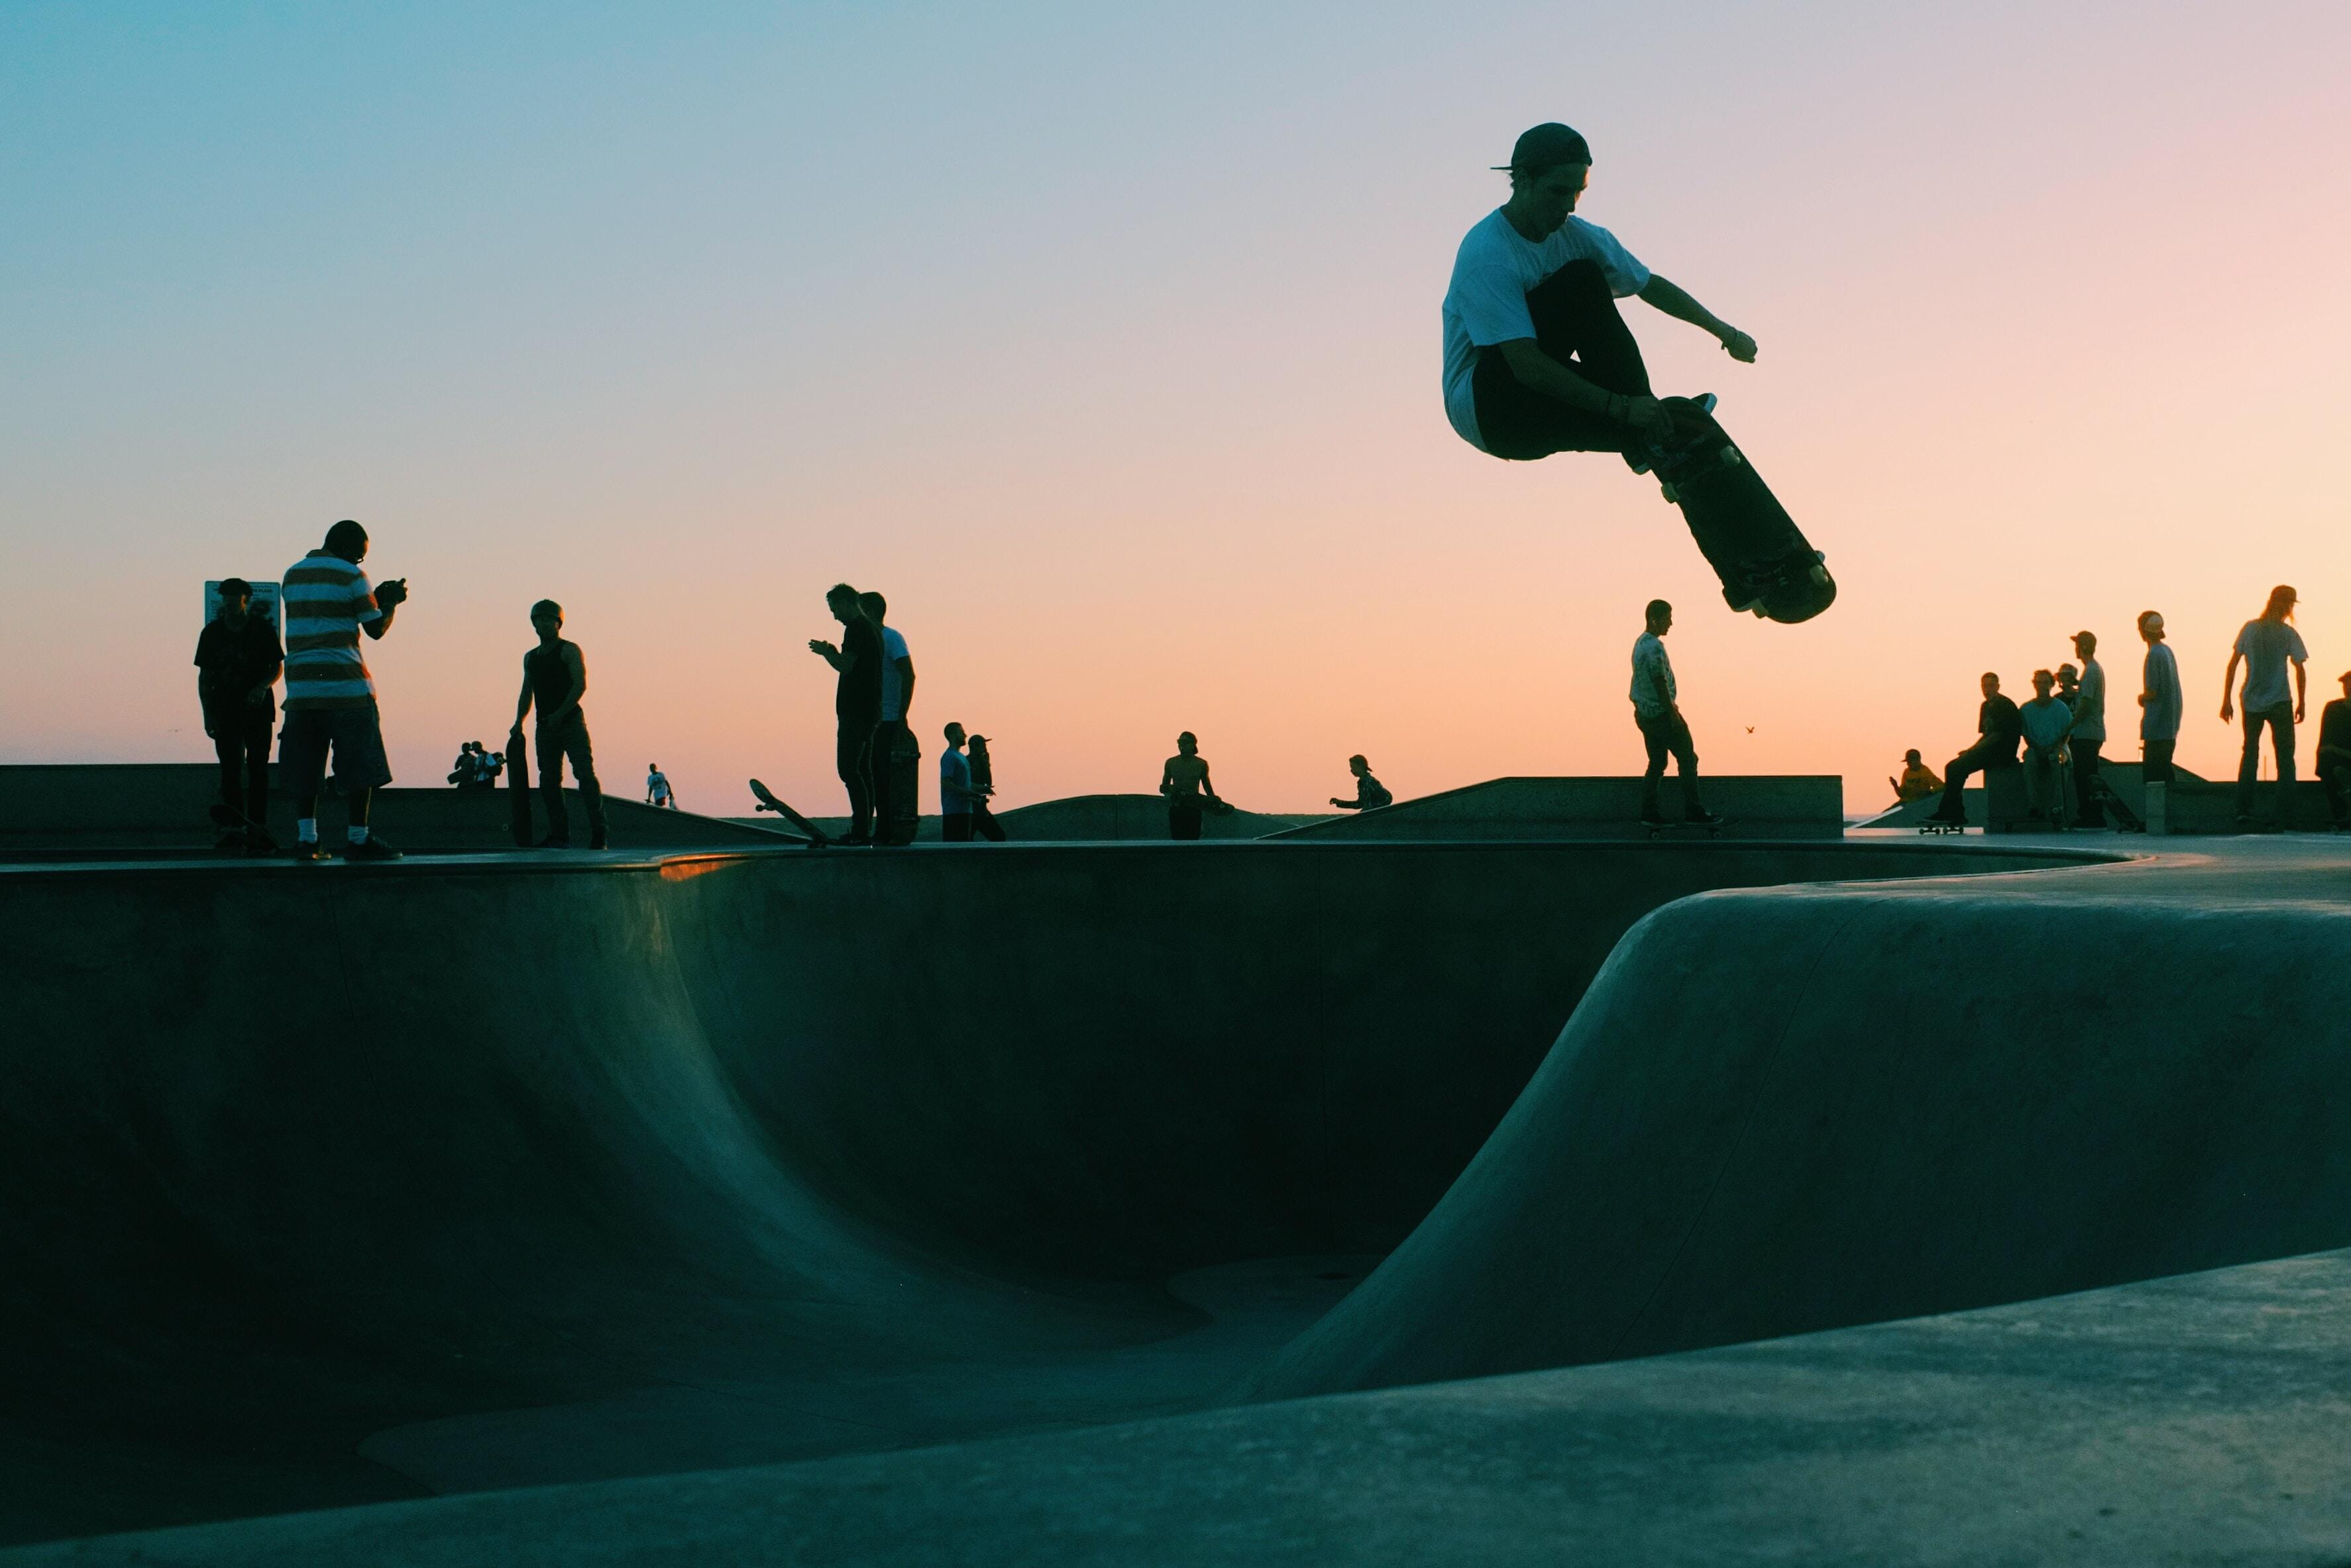 man doing trick at skateboard park during sunset